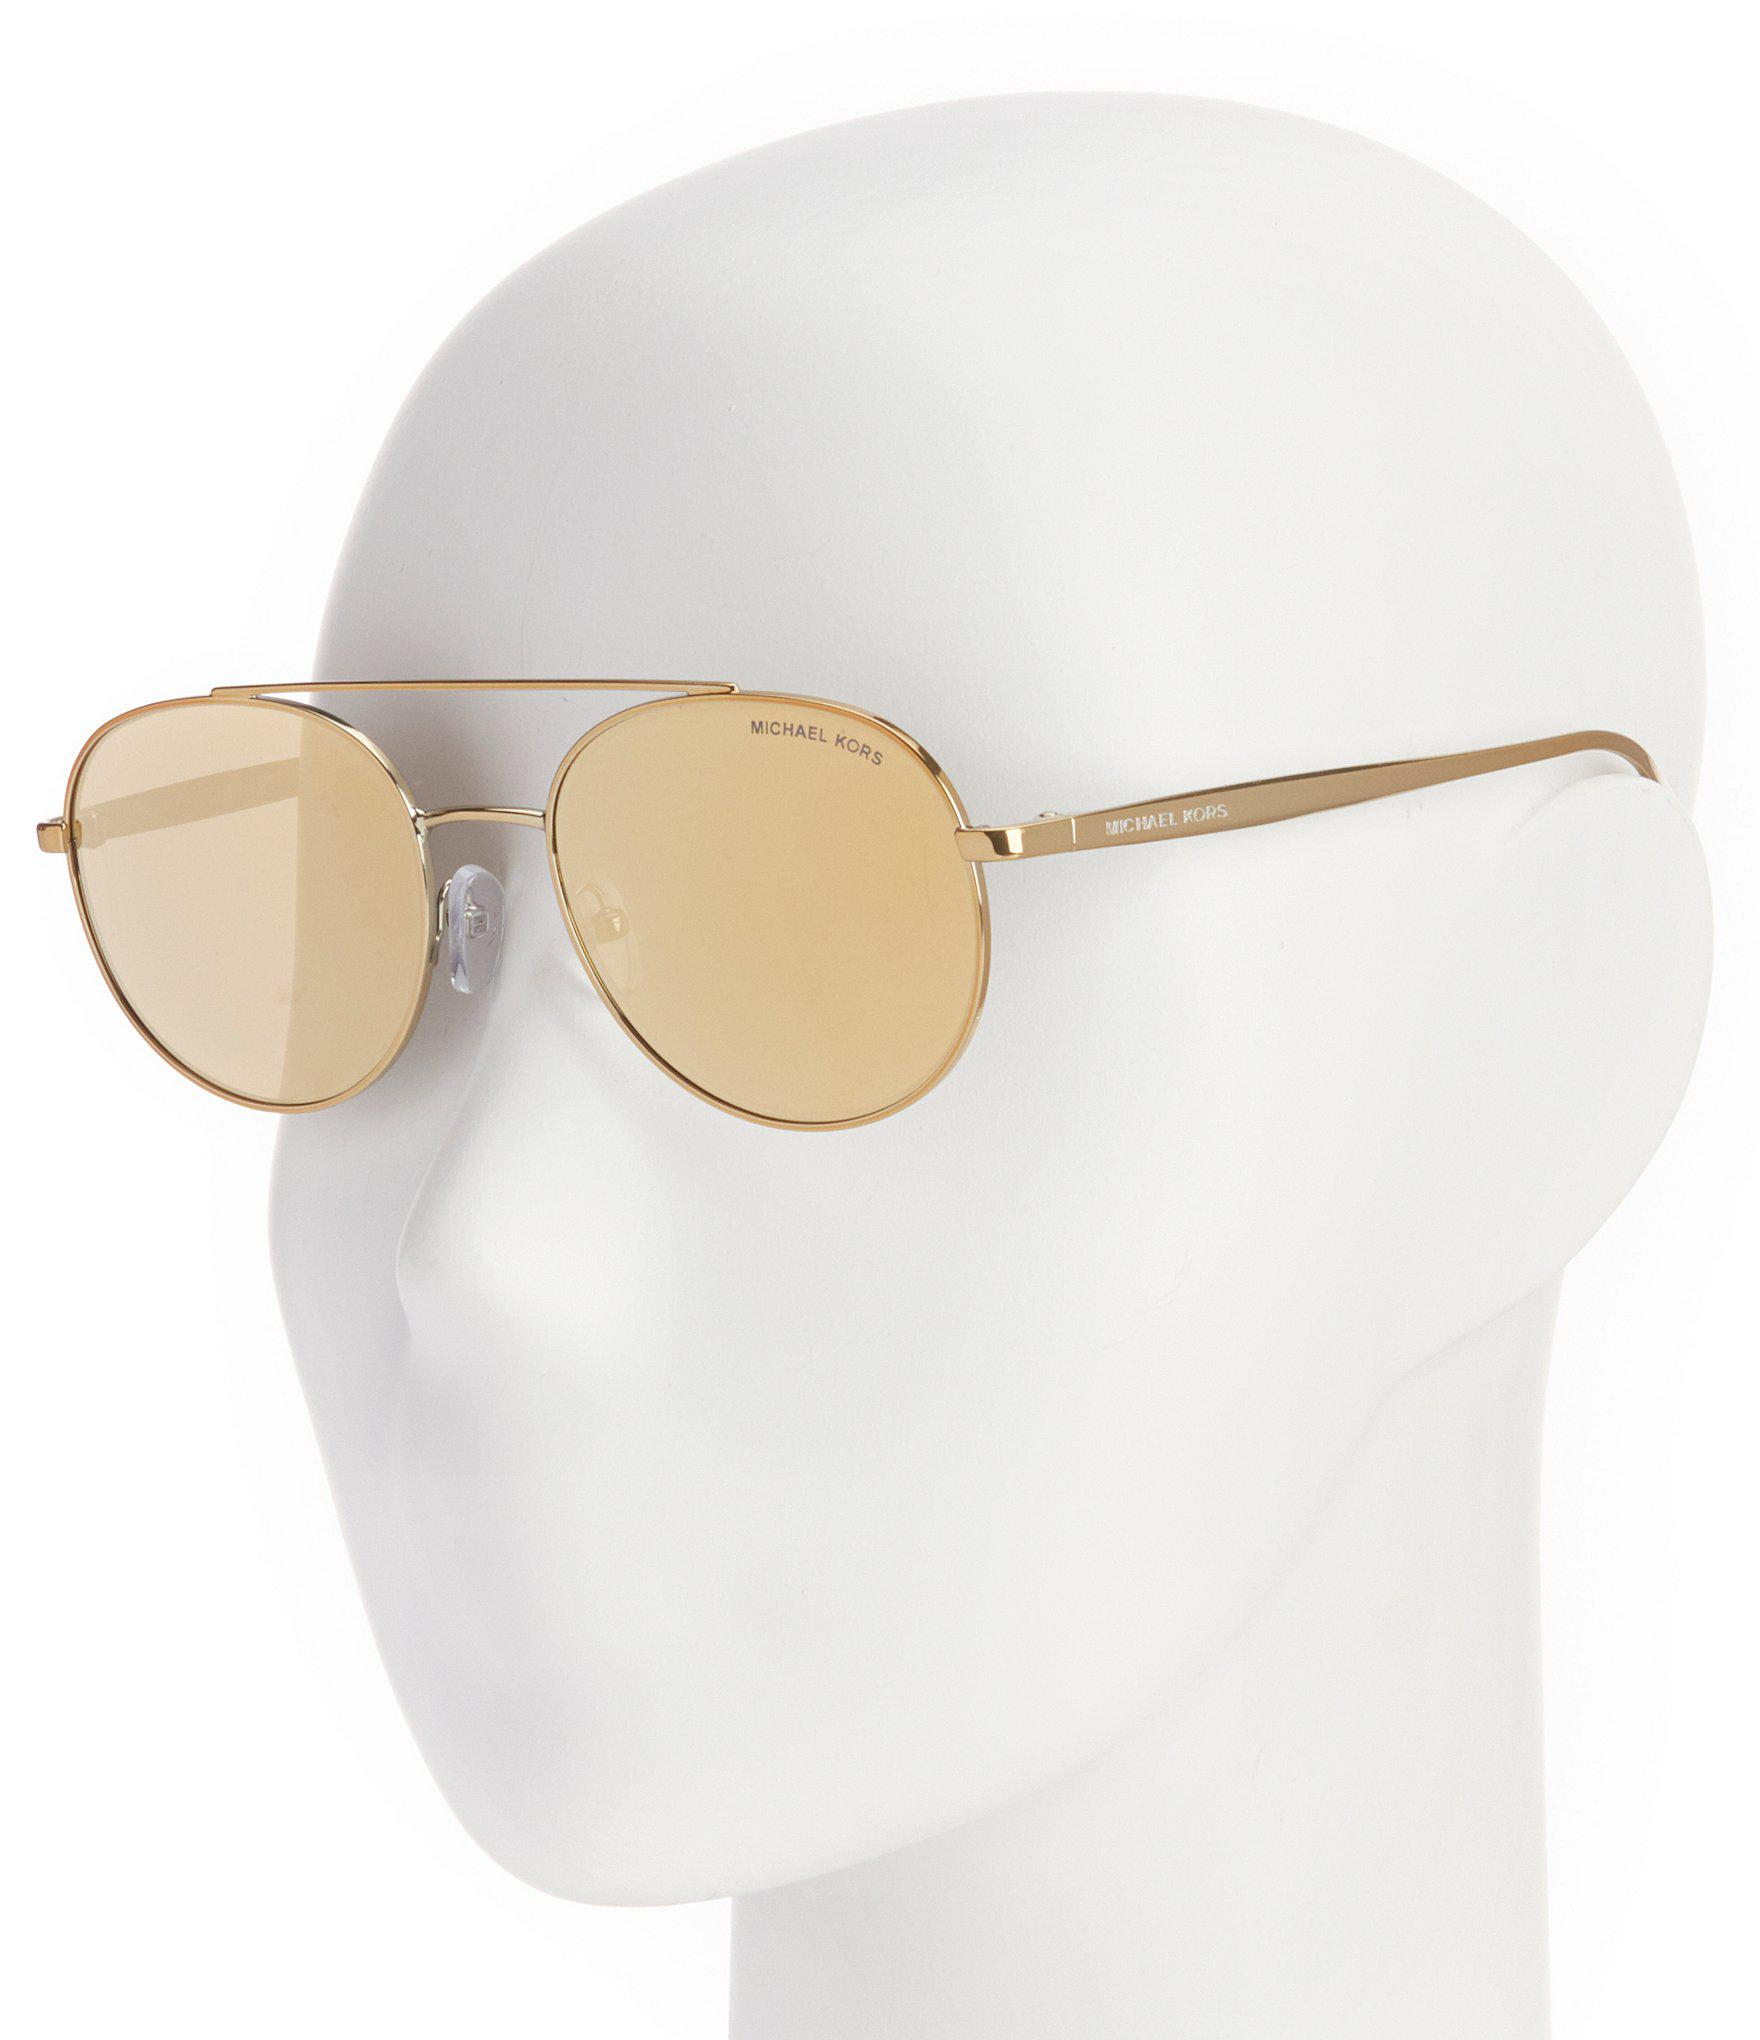 06e1f5223e522 Michael Kors - Metallic Mirrored Aviator Sunglasses - Lyst. View fullscreen